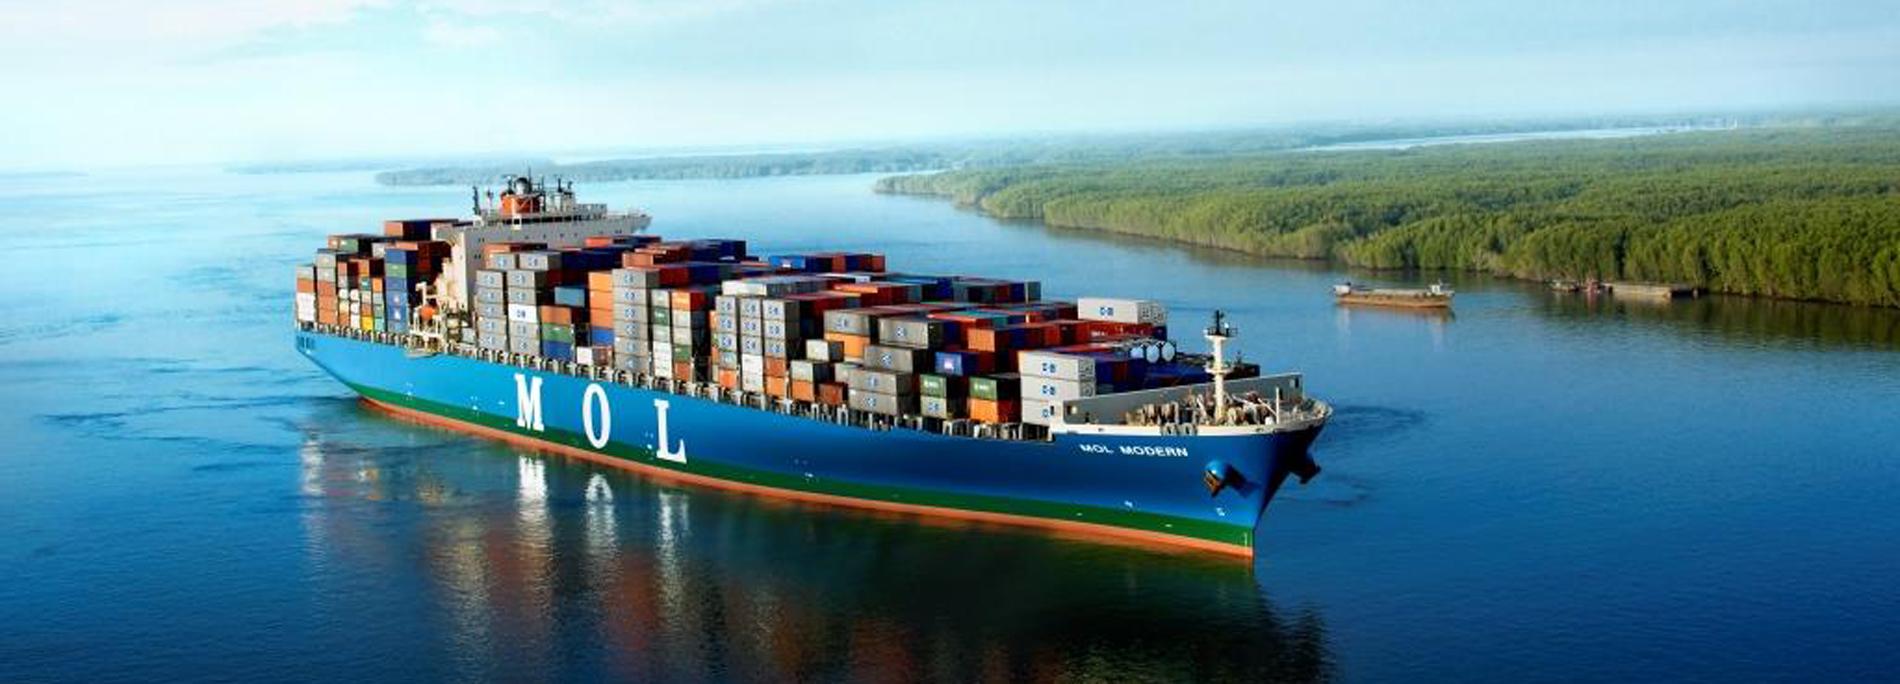 Containership MOL Modern(大型コンテナ船 資料提供 株式会社 商船三井 (不許複製))